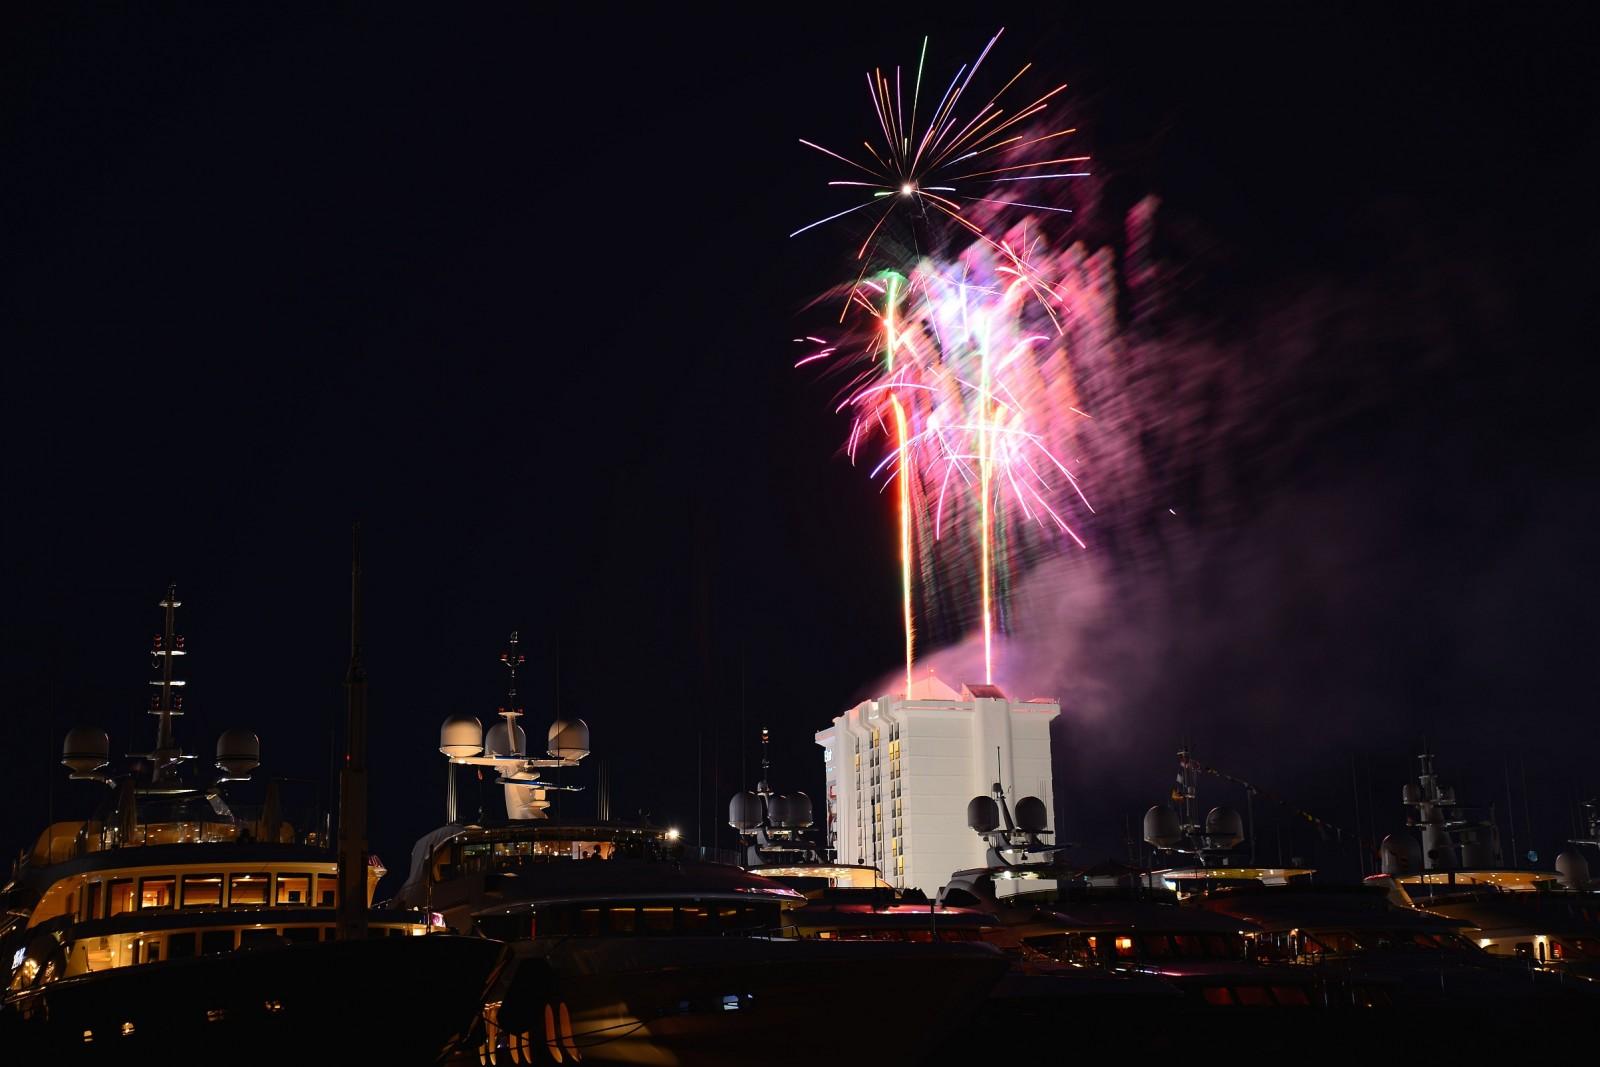 Th Fireworks - DSC_9257.NEF